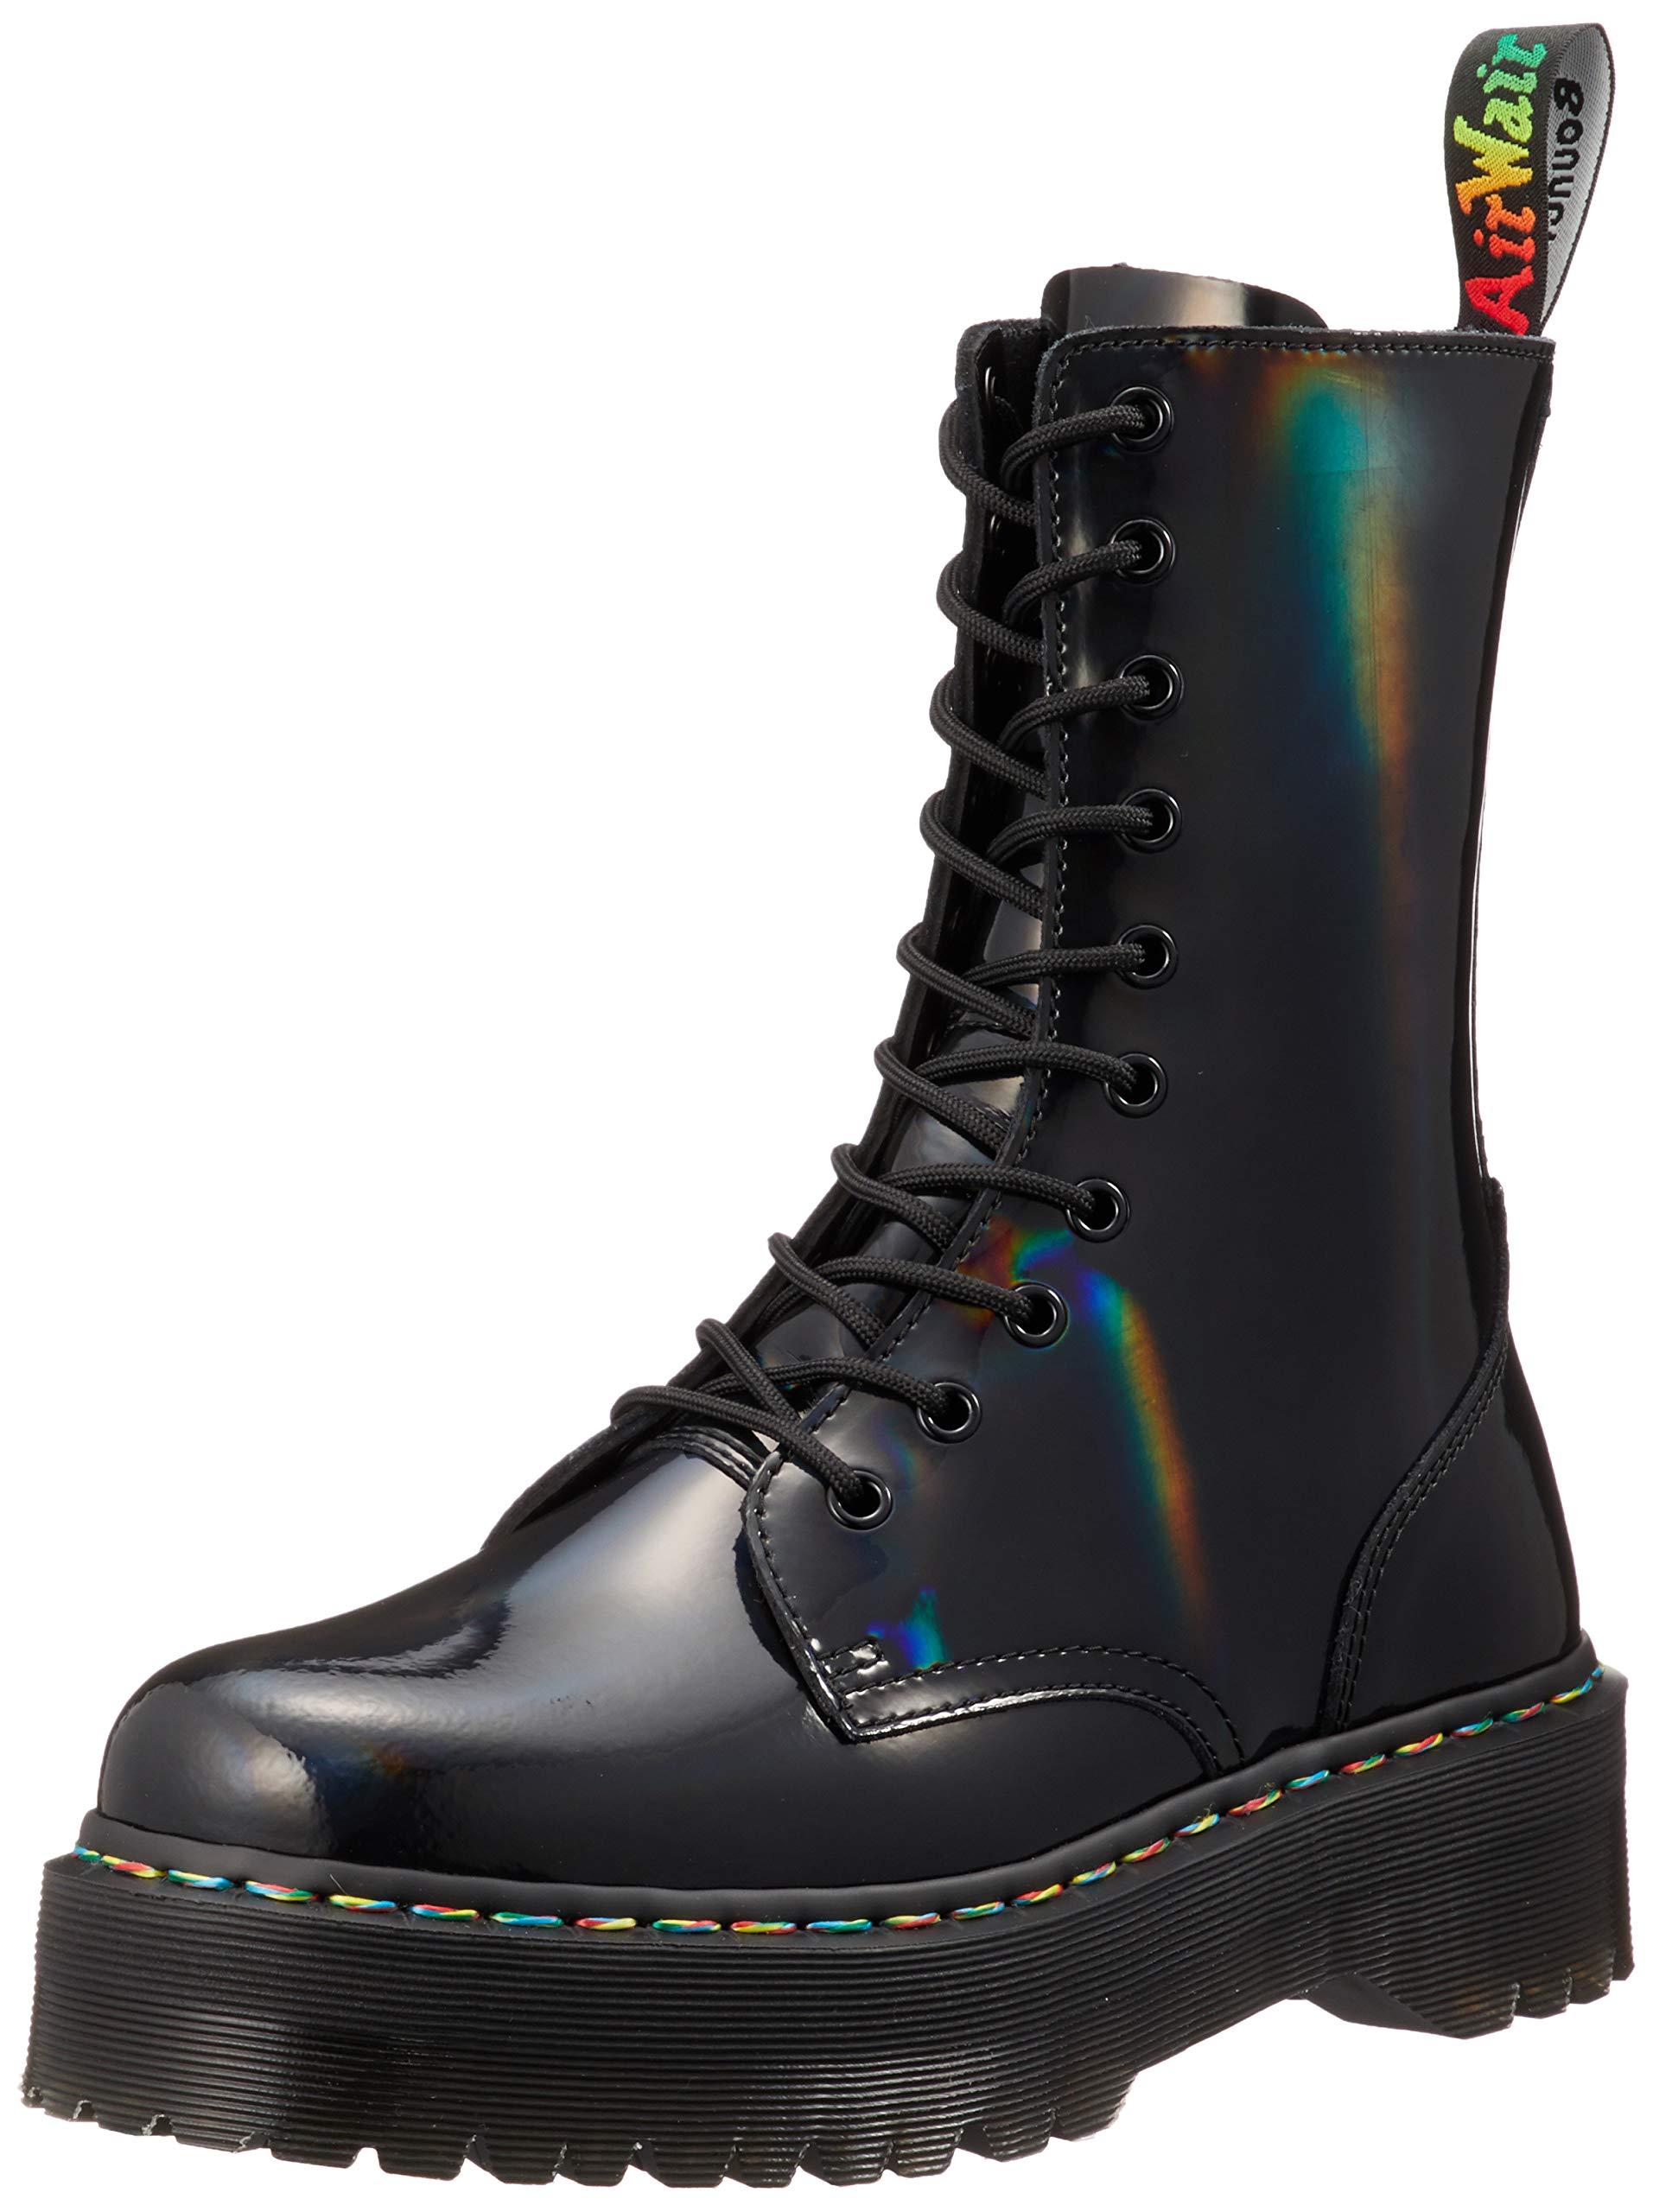 Dr. Martens Women's Jadon 10 Eye Boots, Black Rainbow, 7 M US by Dr. Martens